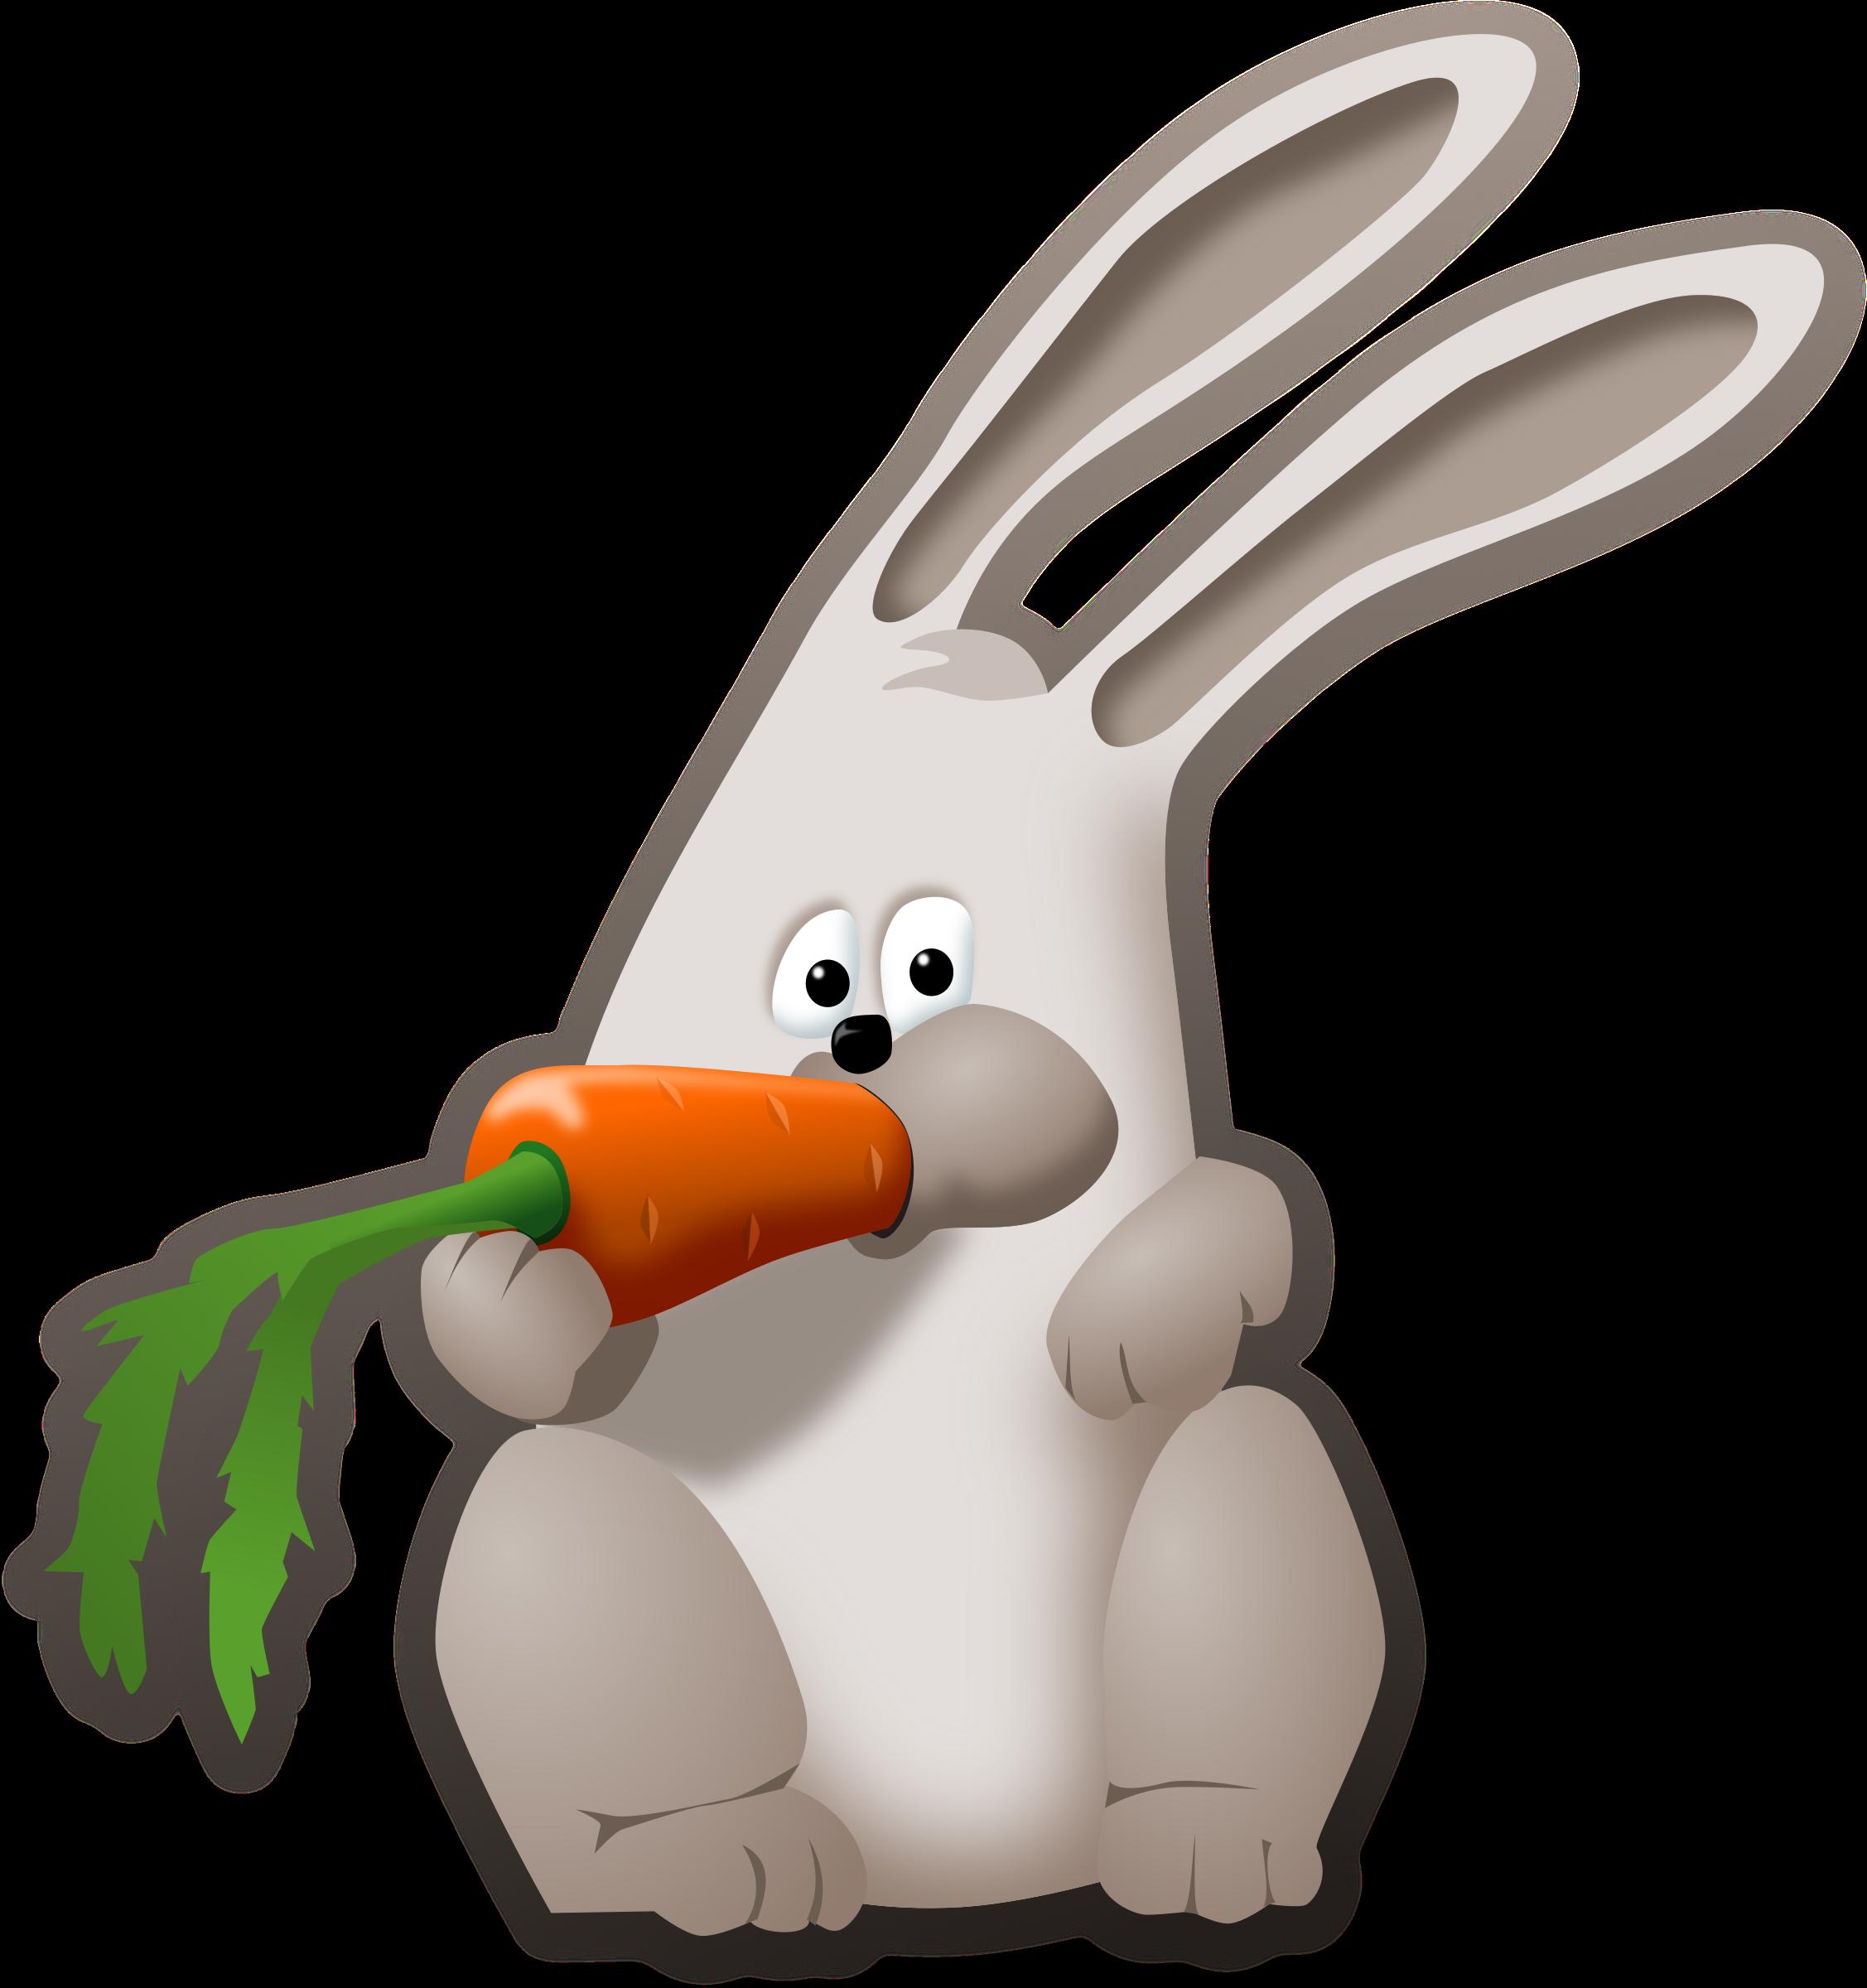 Bunny eating big image. Clipart rabbit carrot